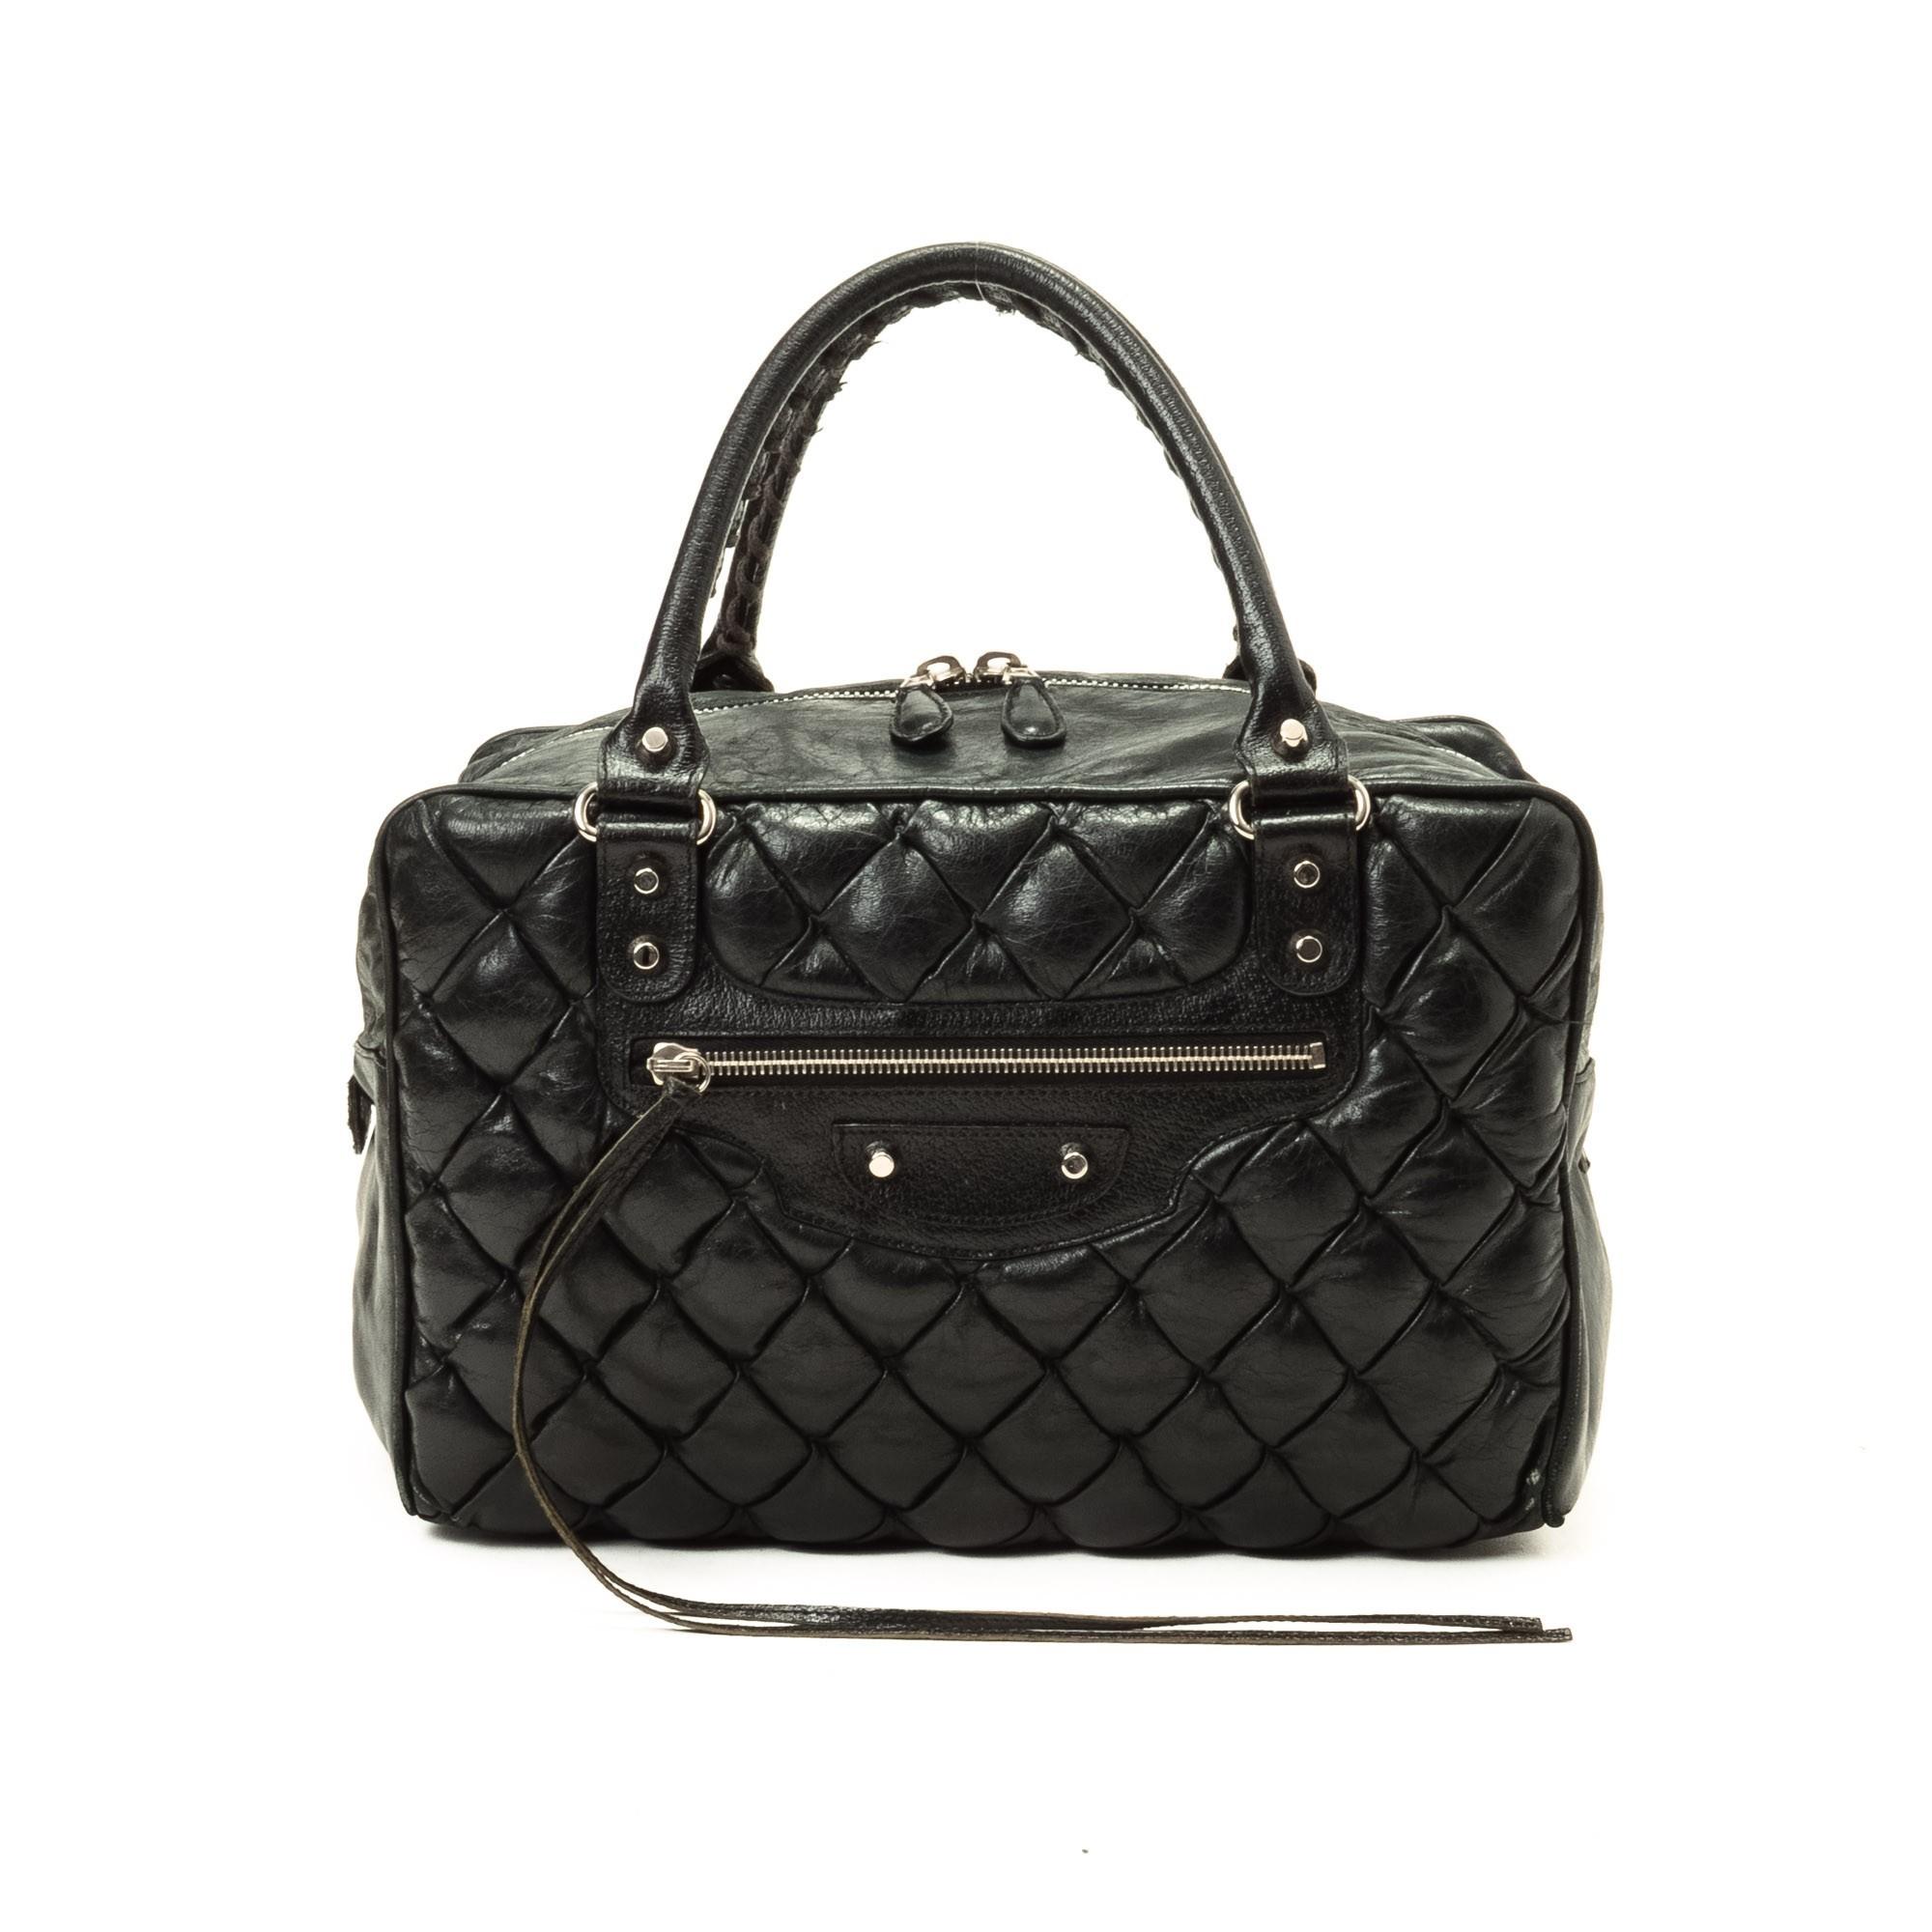 ysl it bag - balenciaga bag look alike, ysl handbags uk